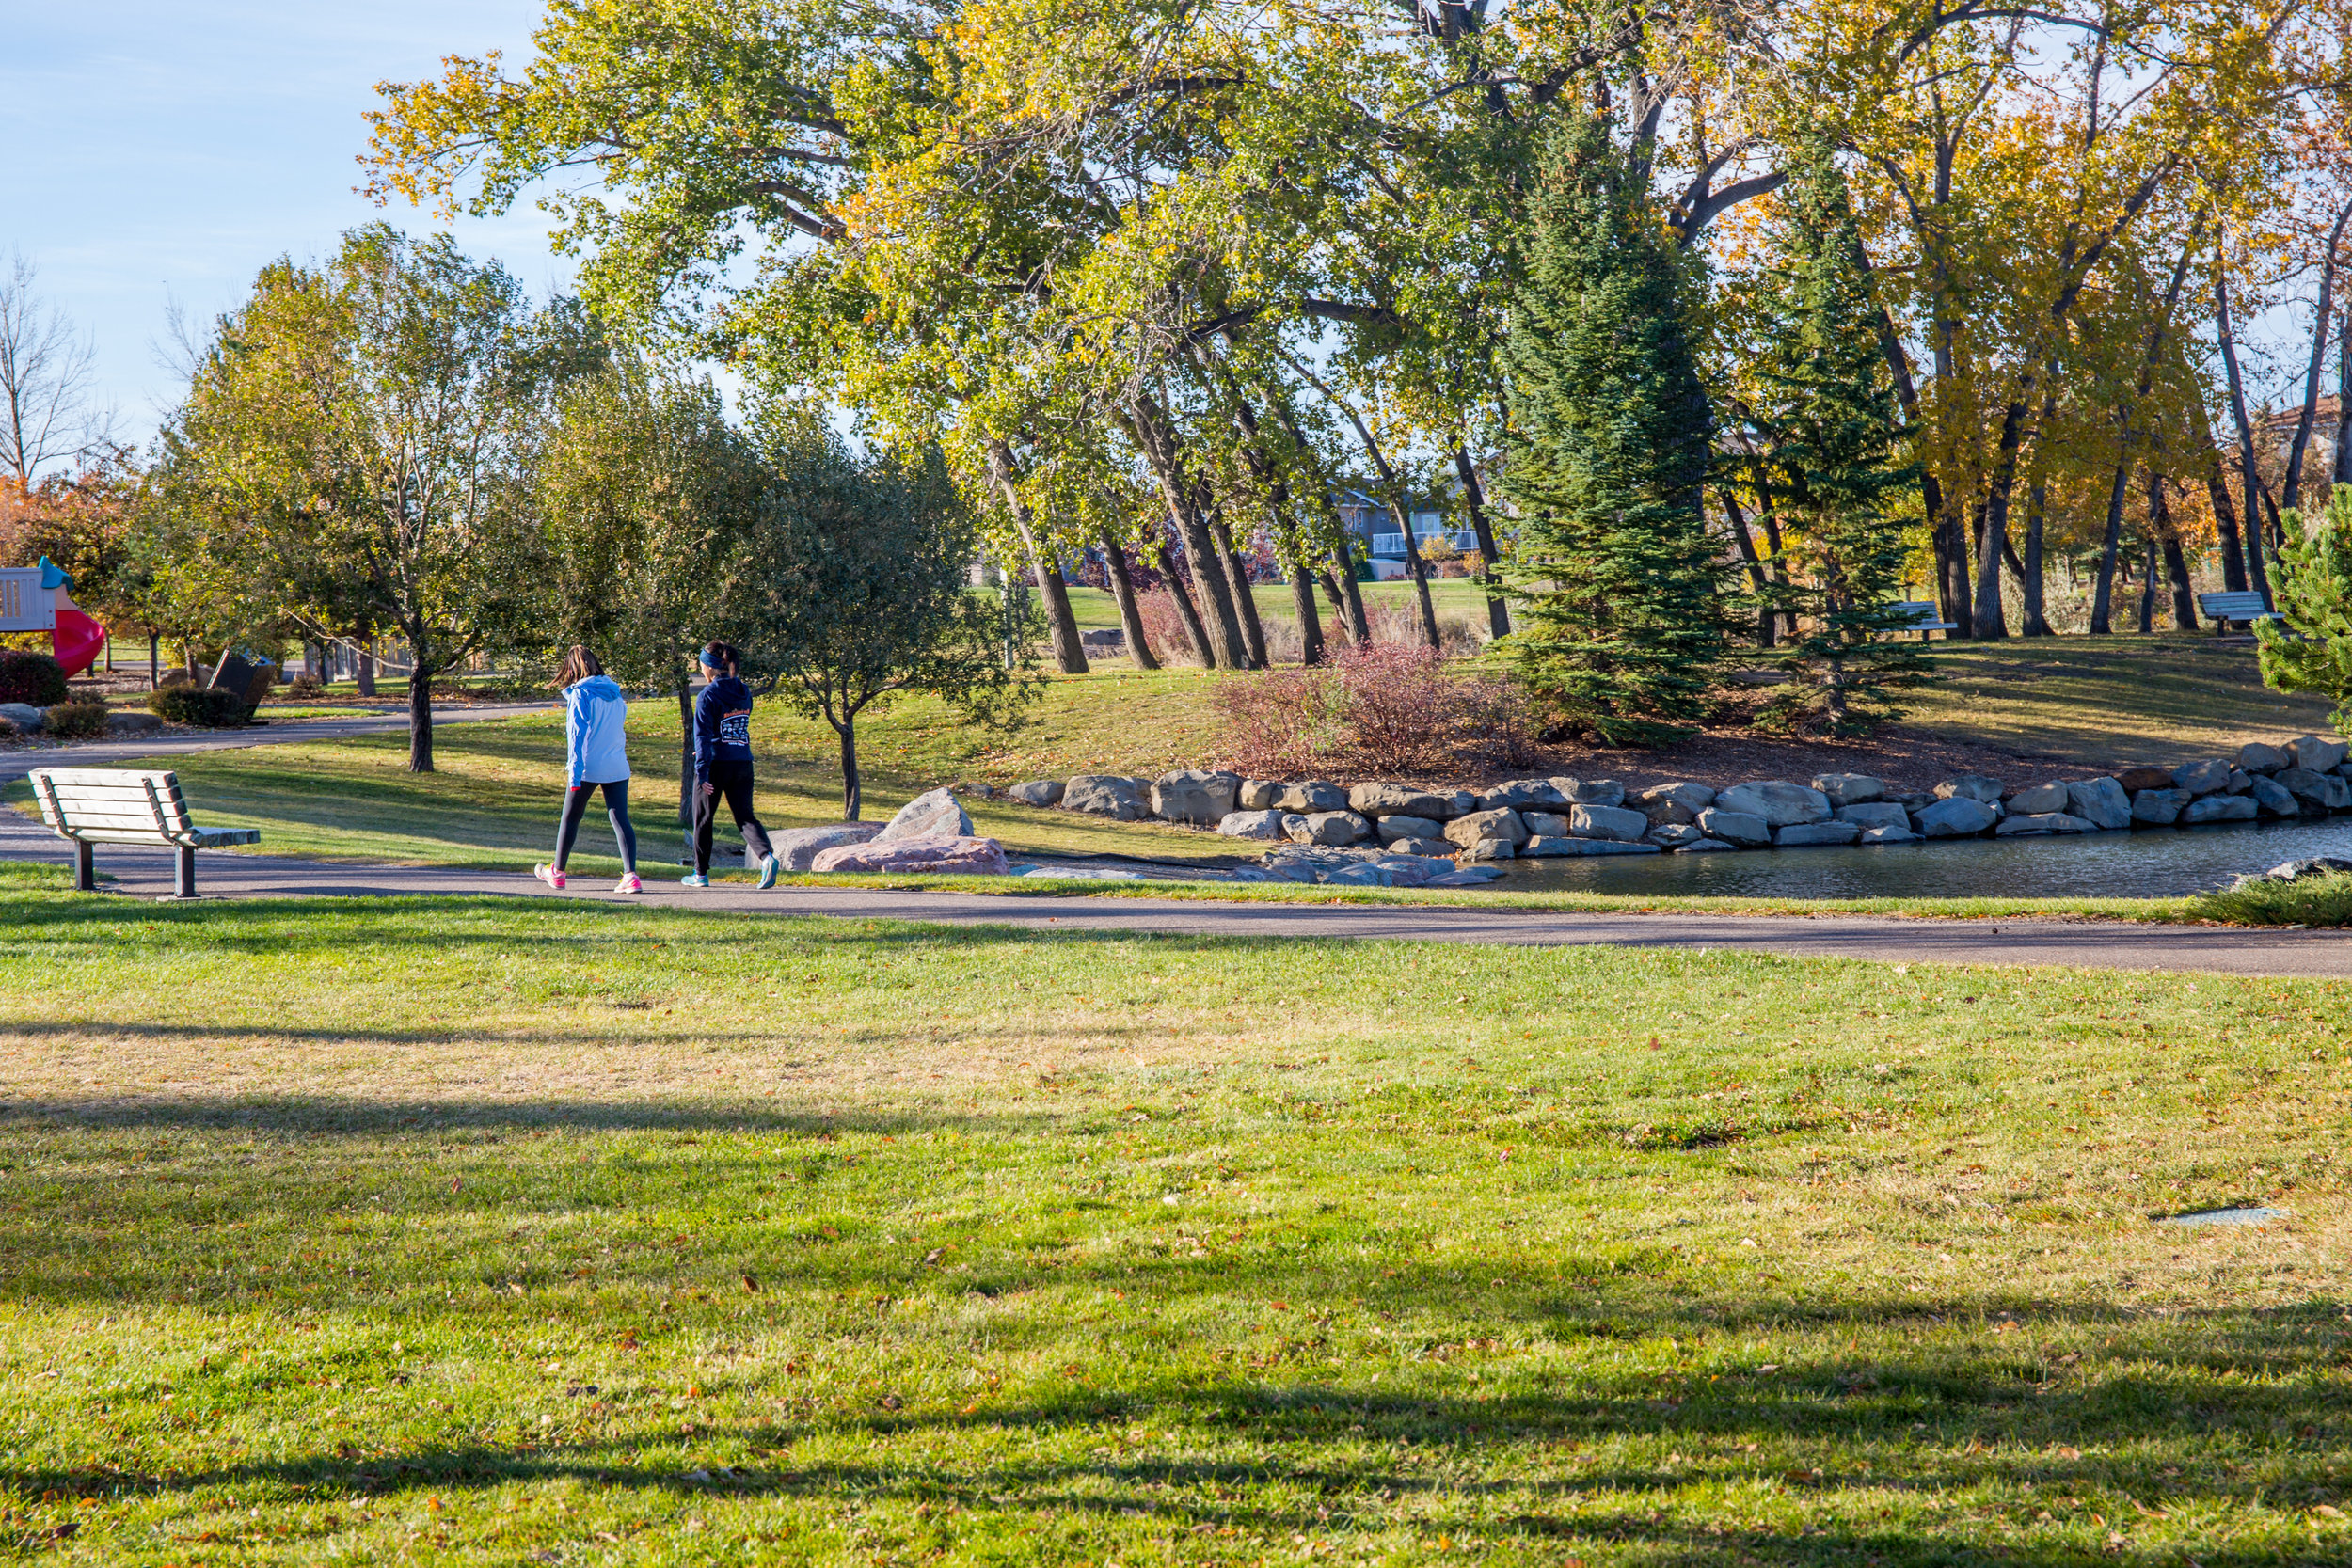 riverstone pond emjoyimg a walk (1 of 1).jpg